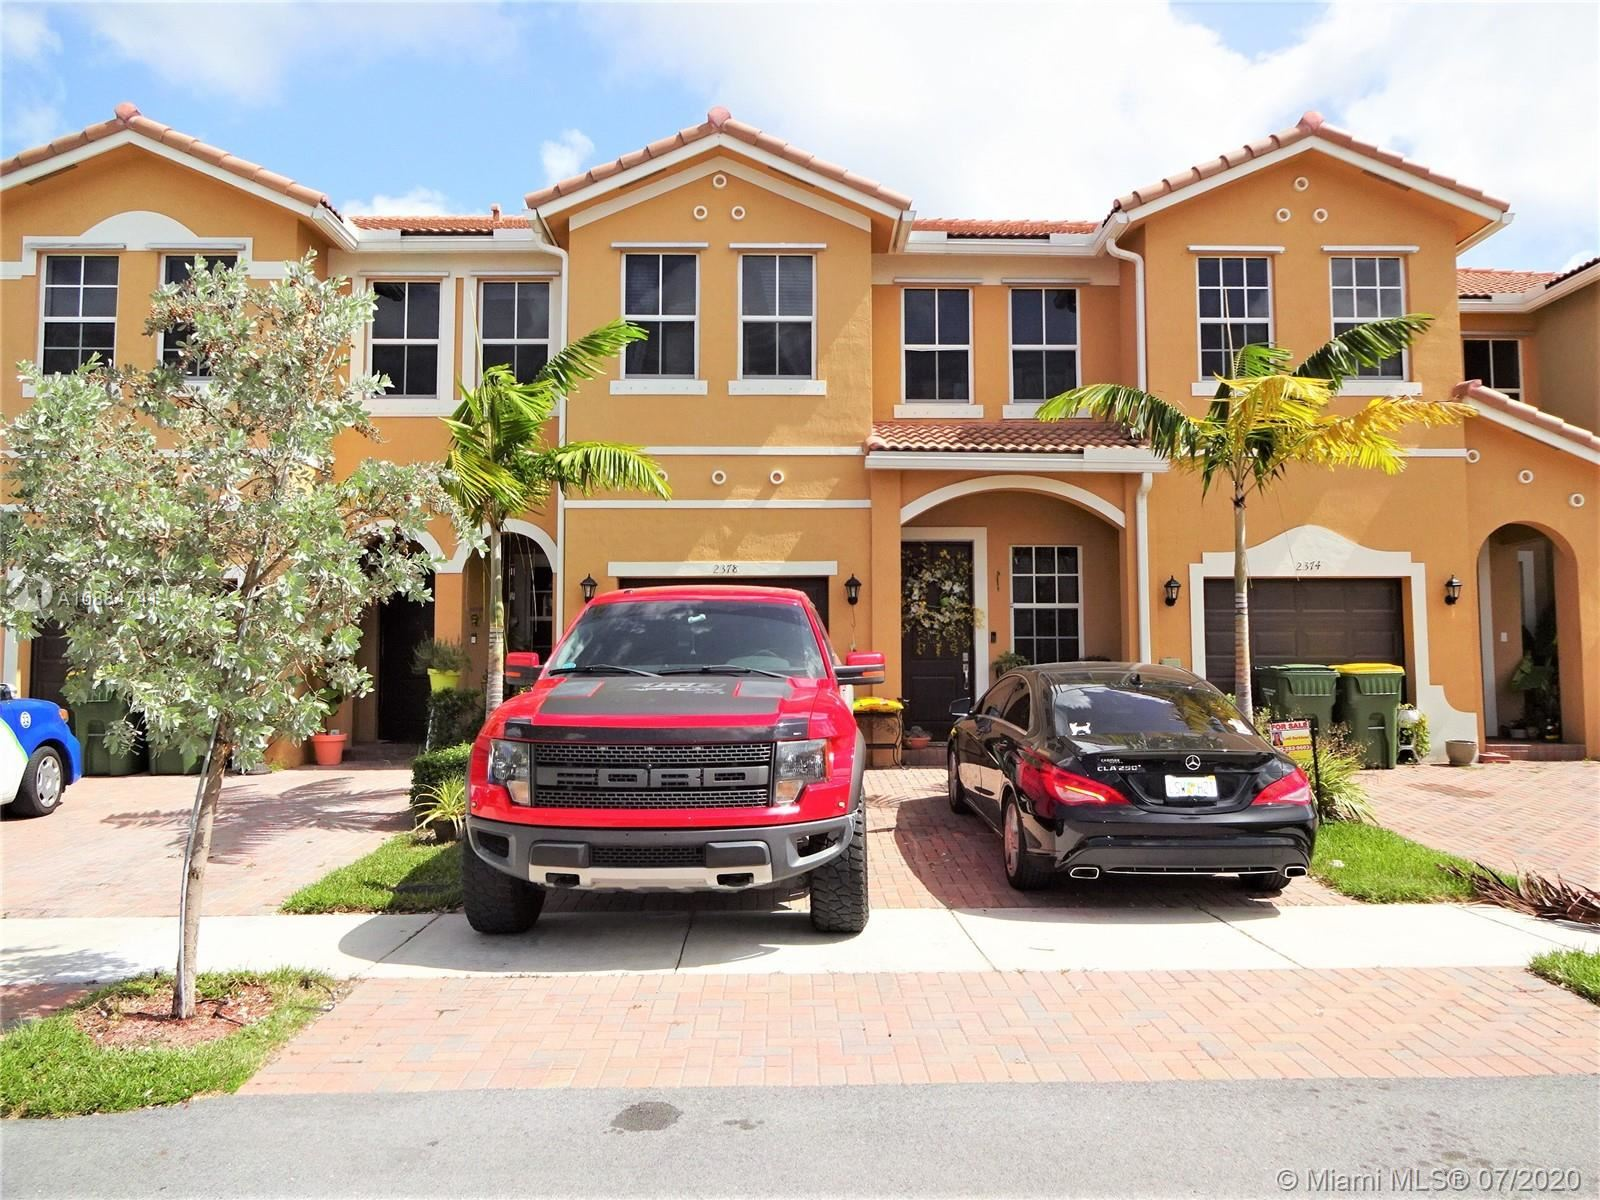 2378 SE 15 St, Homestead, FL 33035 - #: A10884741